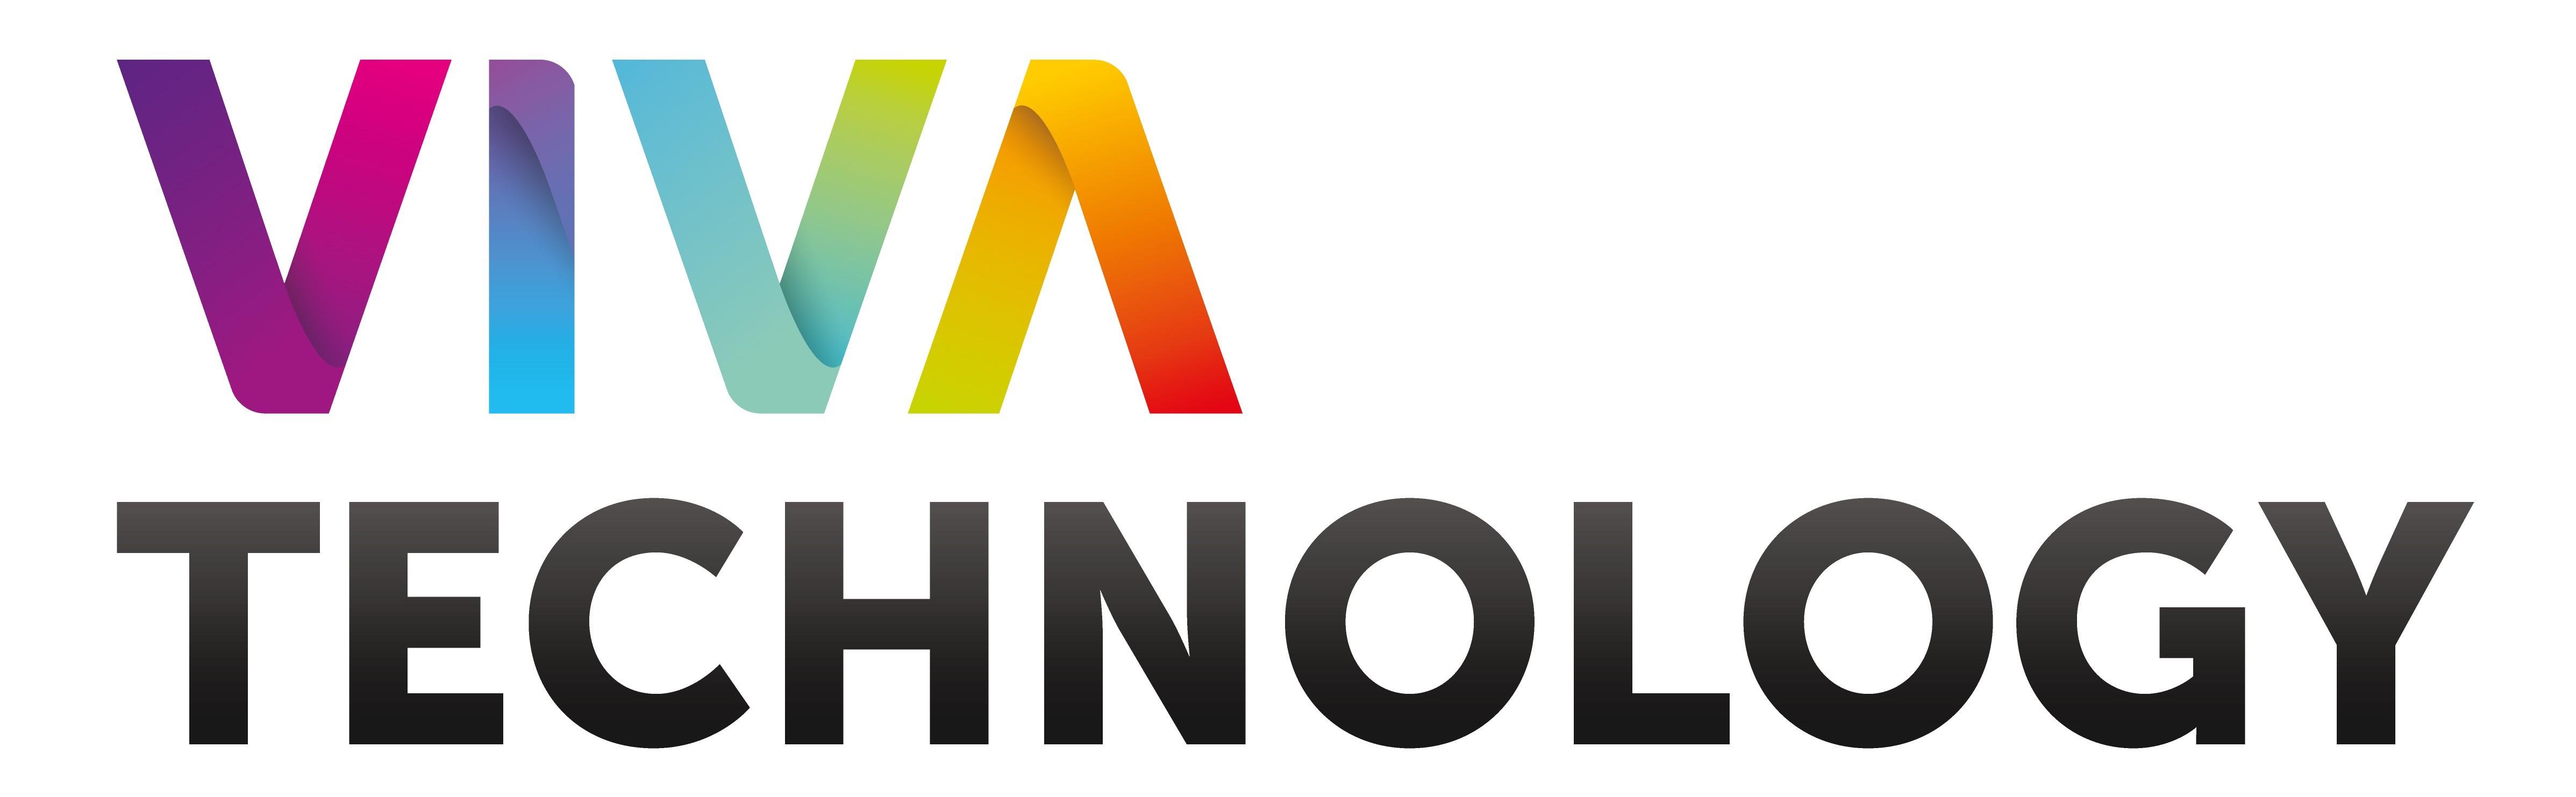 Viva_Technology